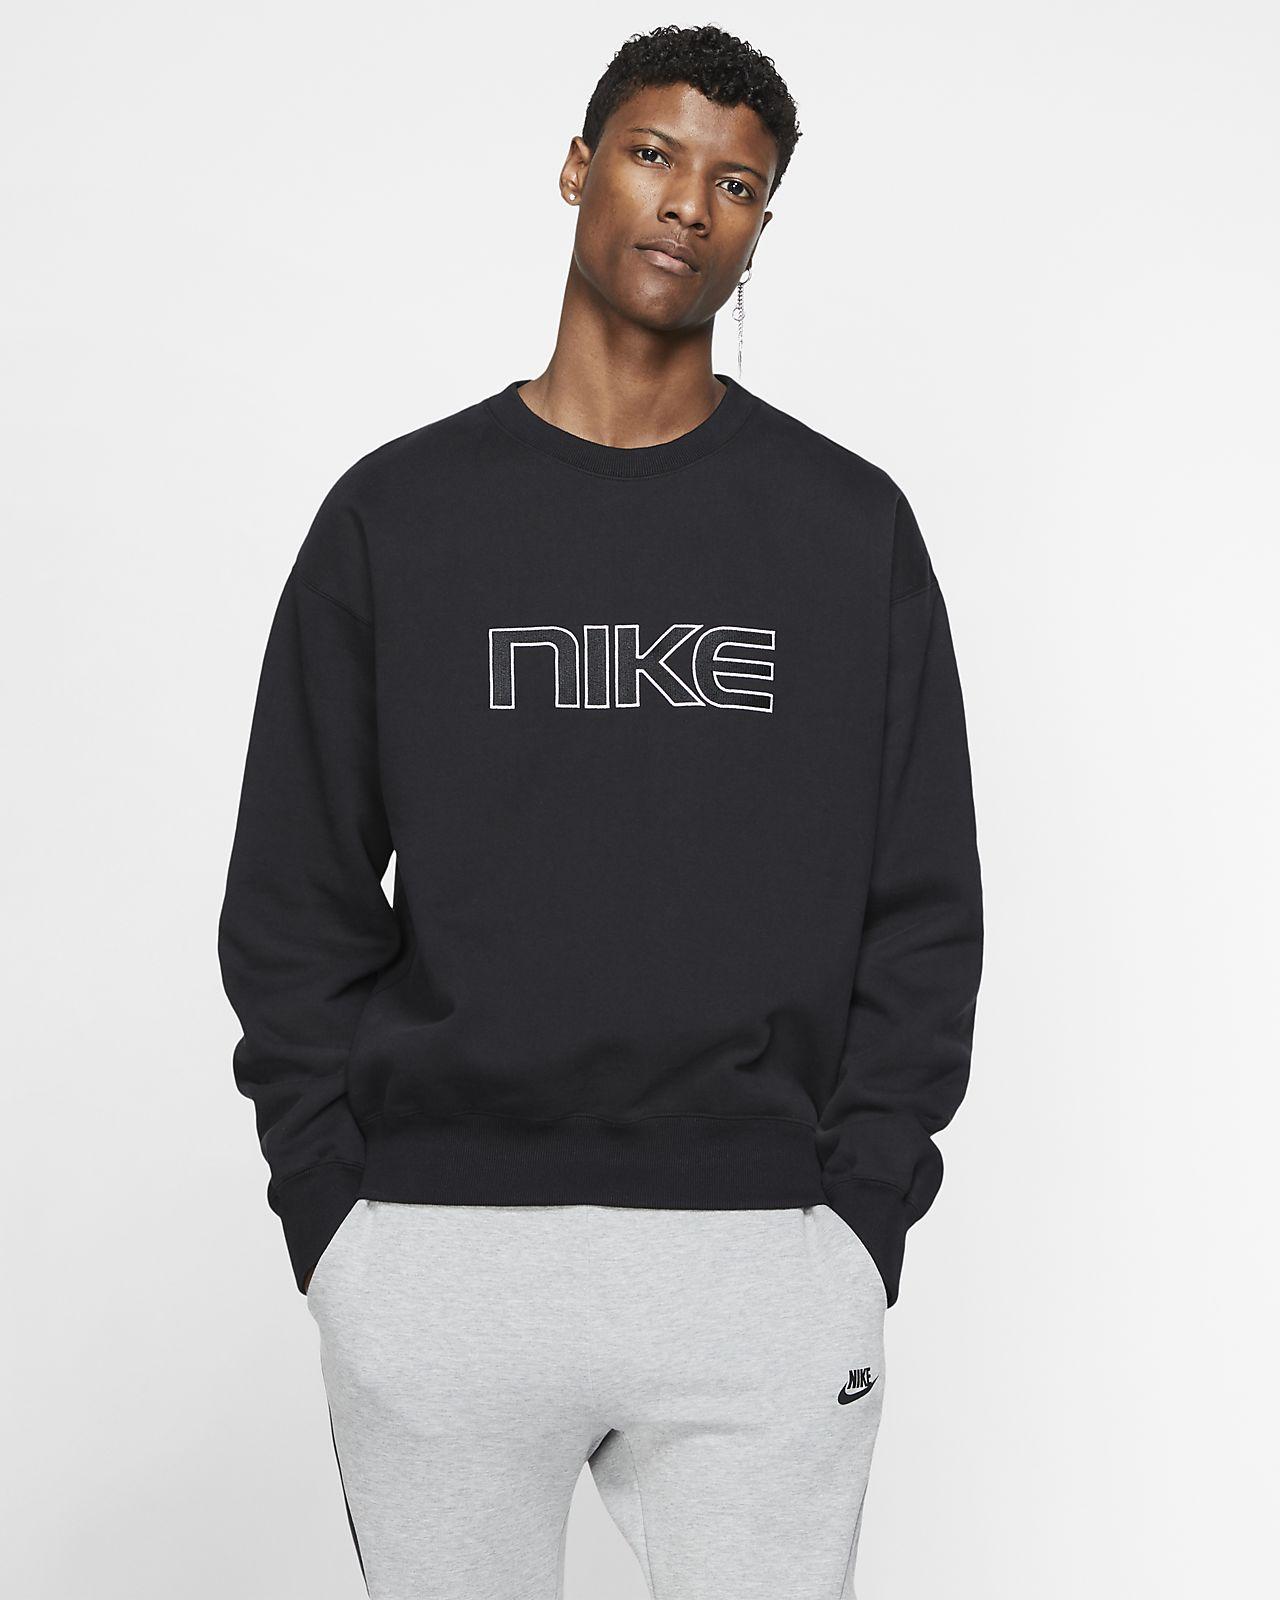 Sudadera para hombre NikeLab Collection